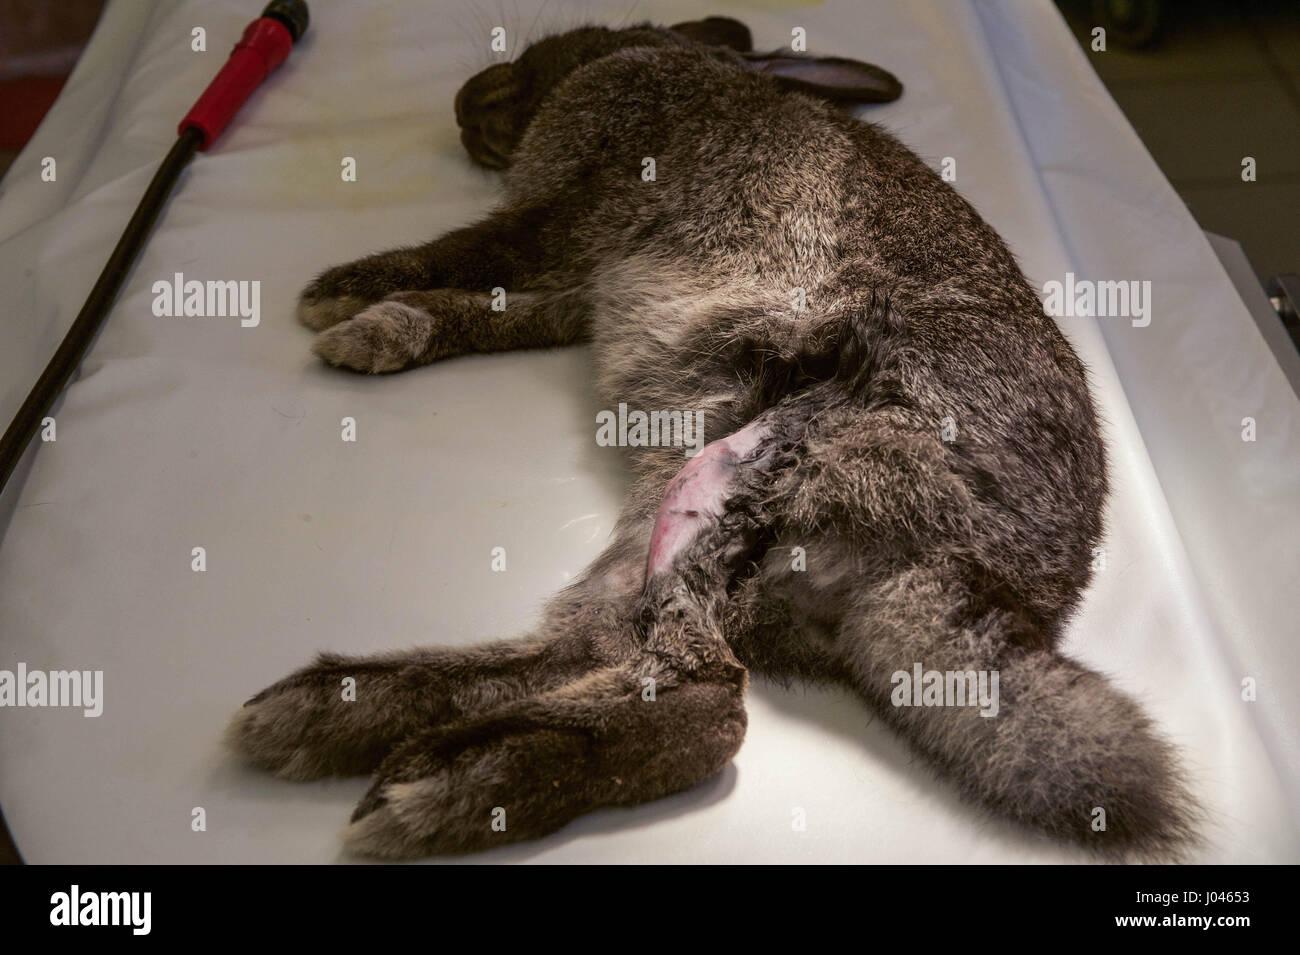 Preparing rabbit for surgery - Stock Image